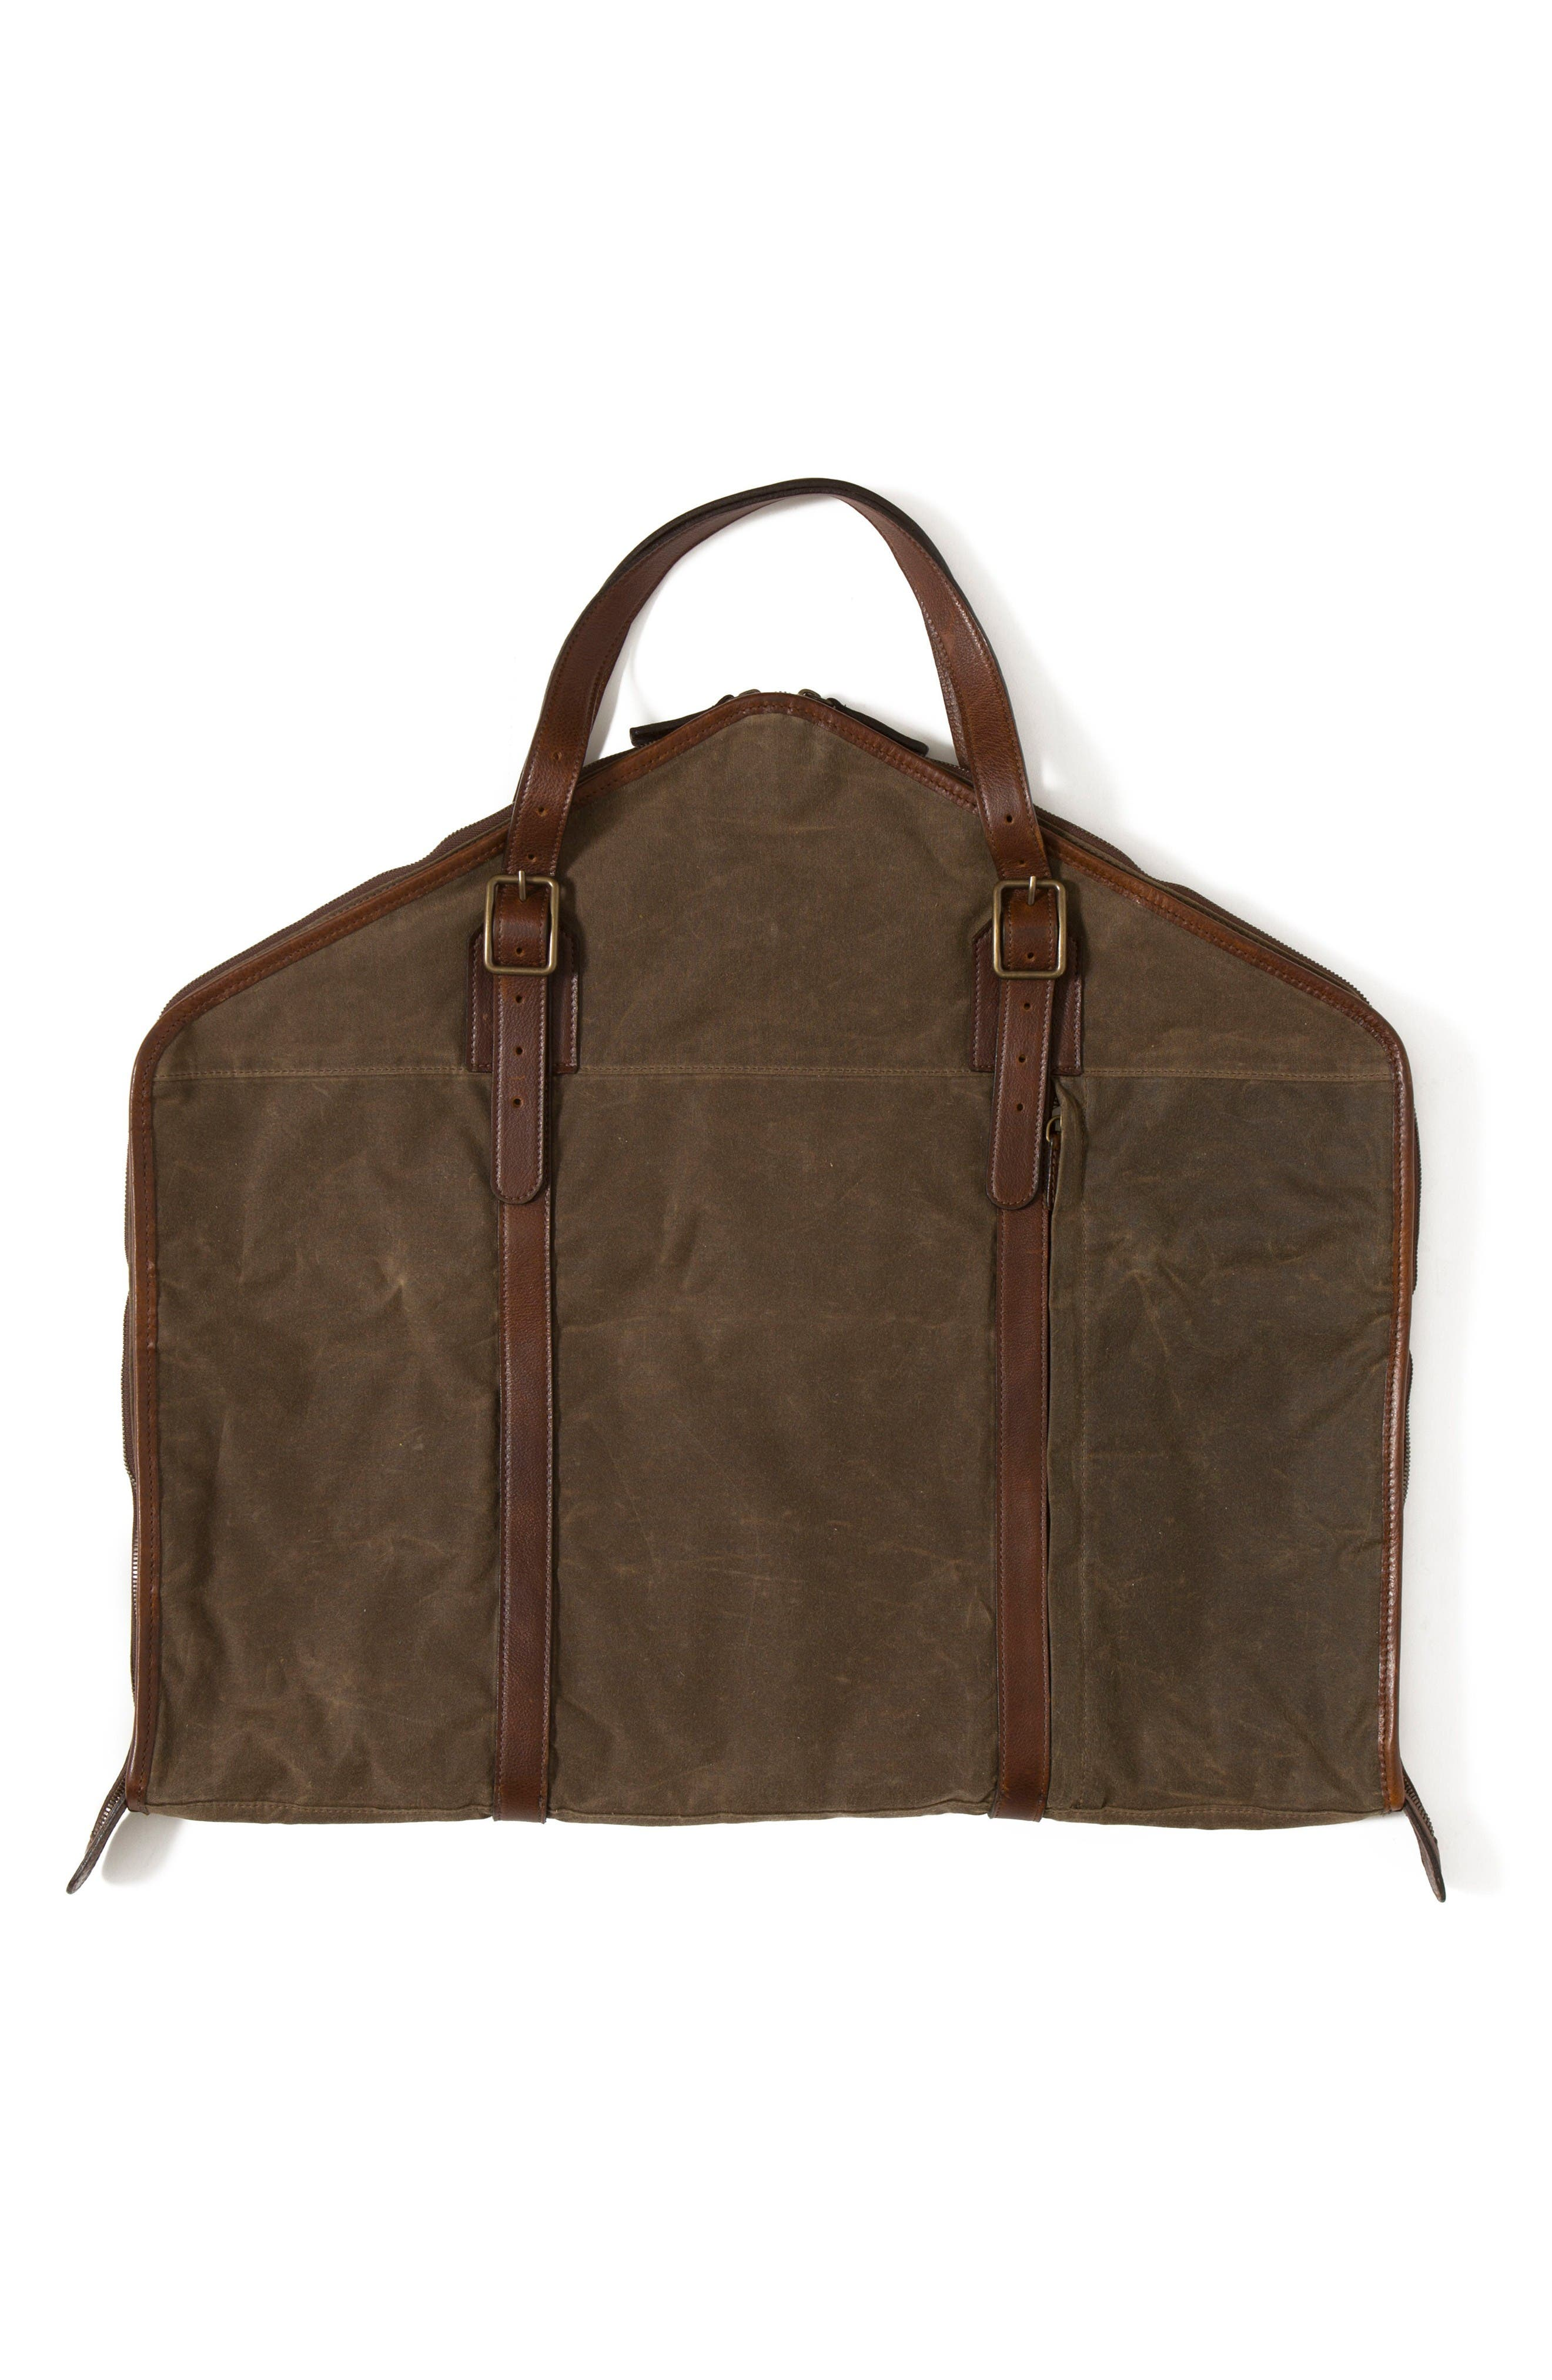 Moore & Giles Stanley Garment Bag